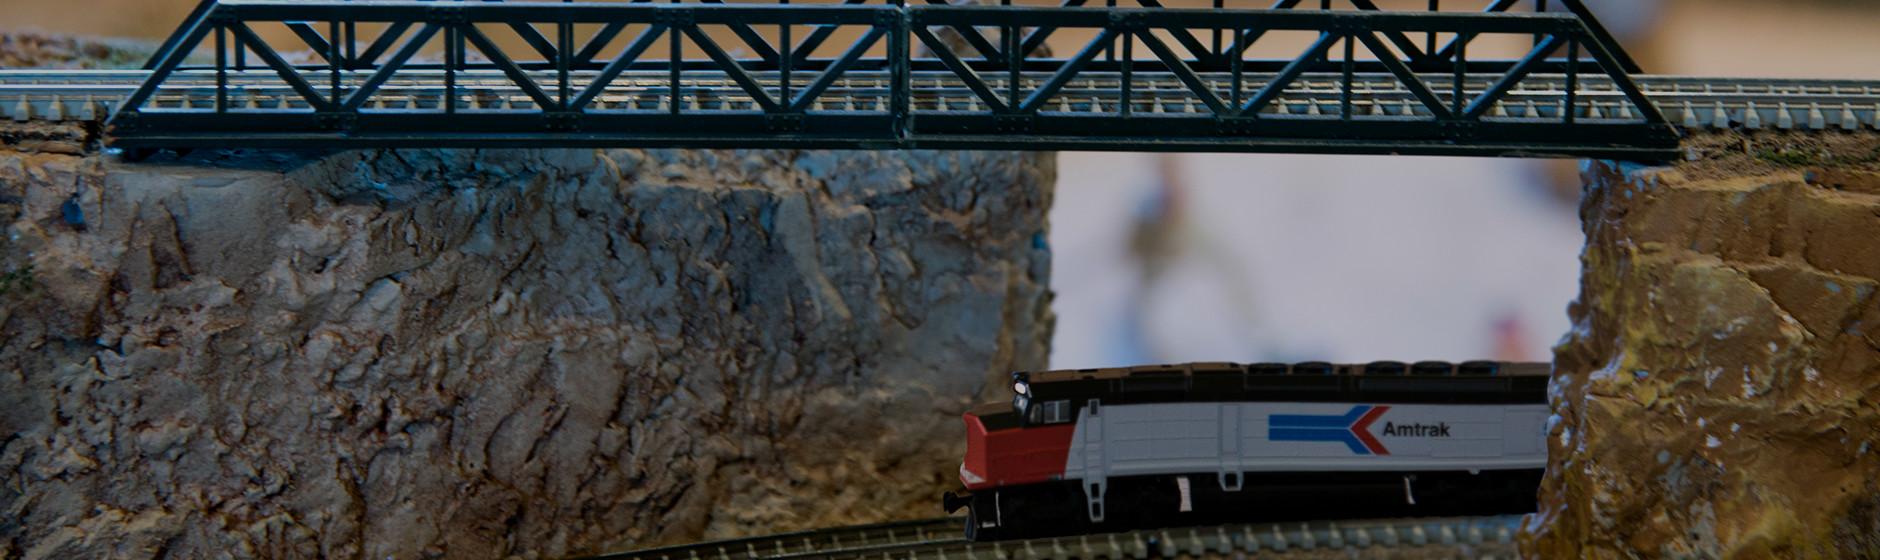 Little Trains - Big Fun